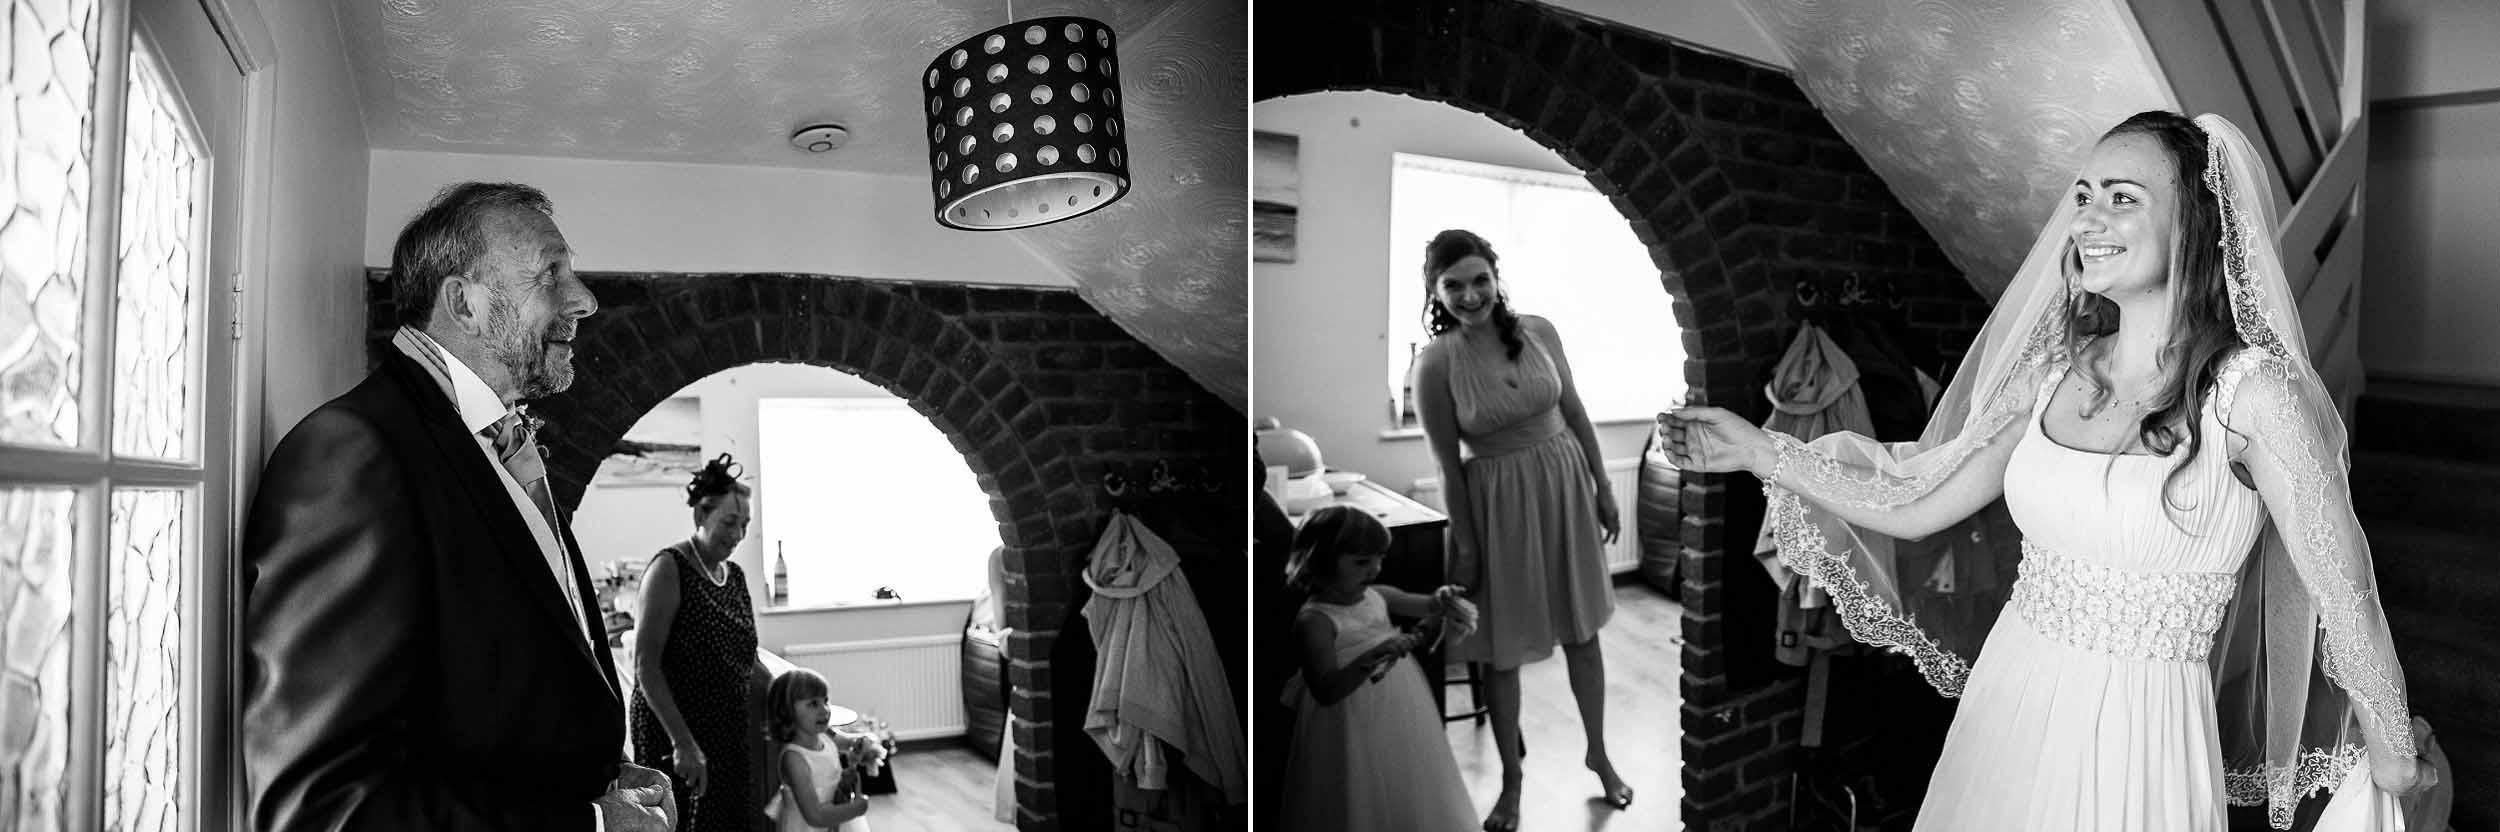 Marks-Hall-Wedding-Photographer-19.jpg